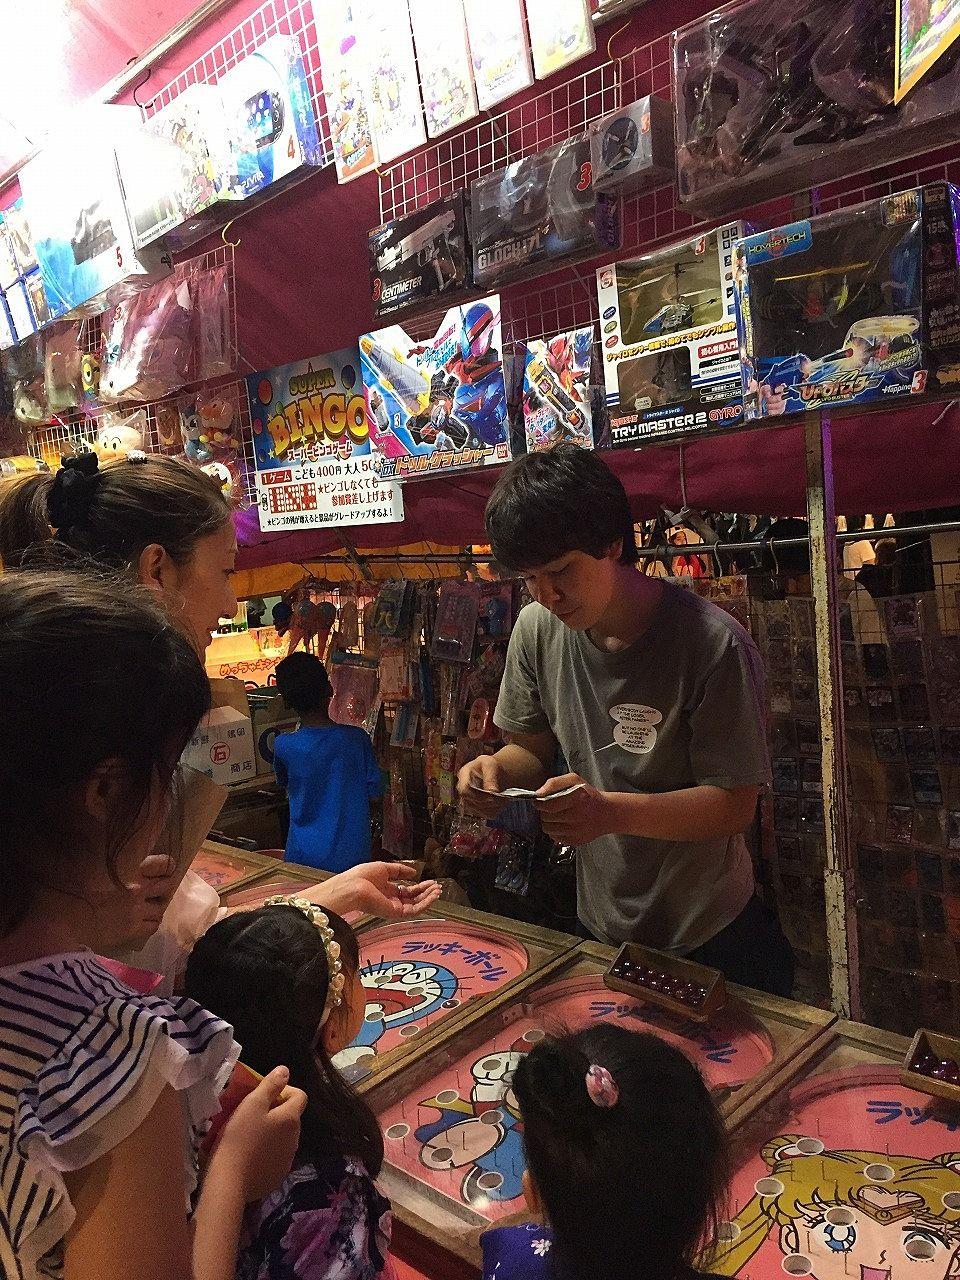 PS4やドローンなど豪華商品多数の文京区本駒込の駒込富士神社の縁日